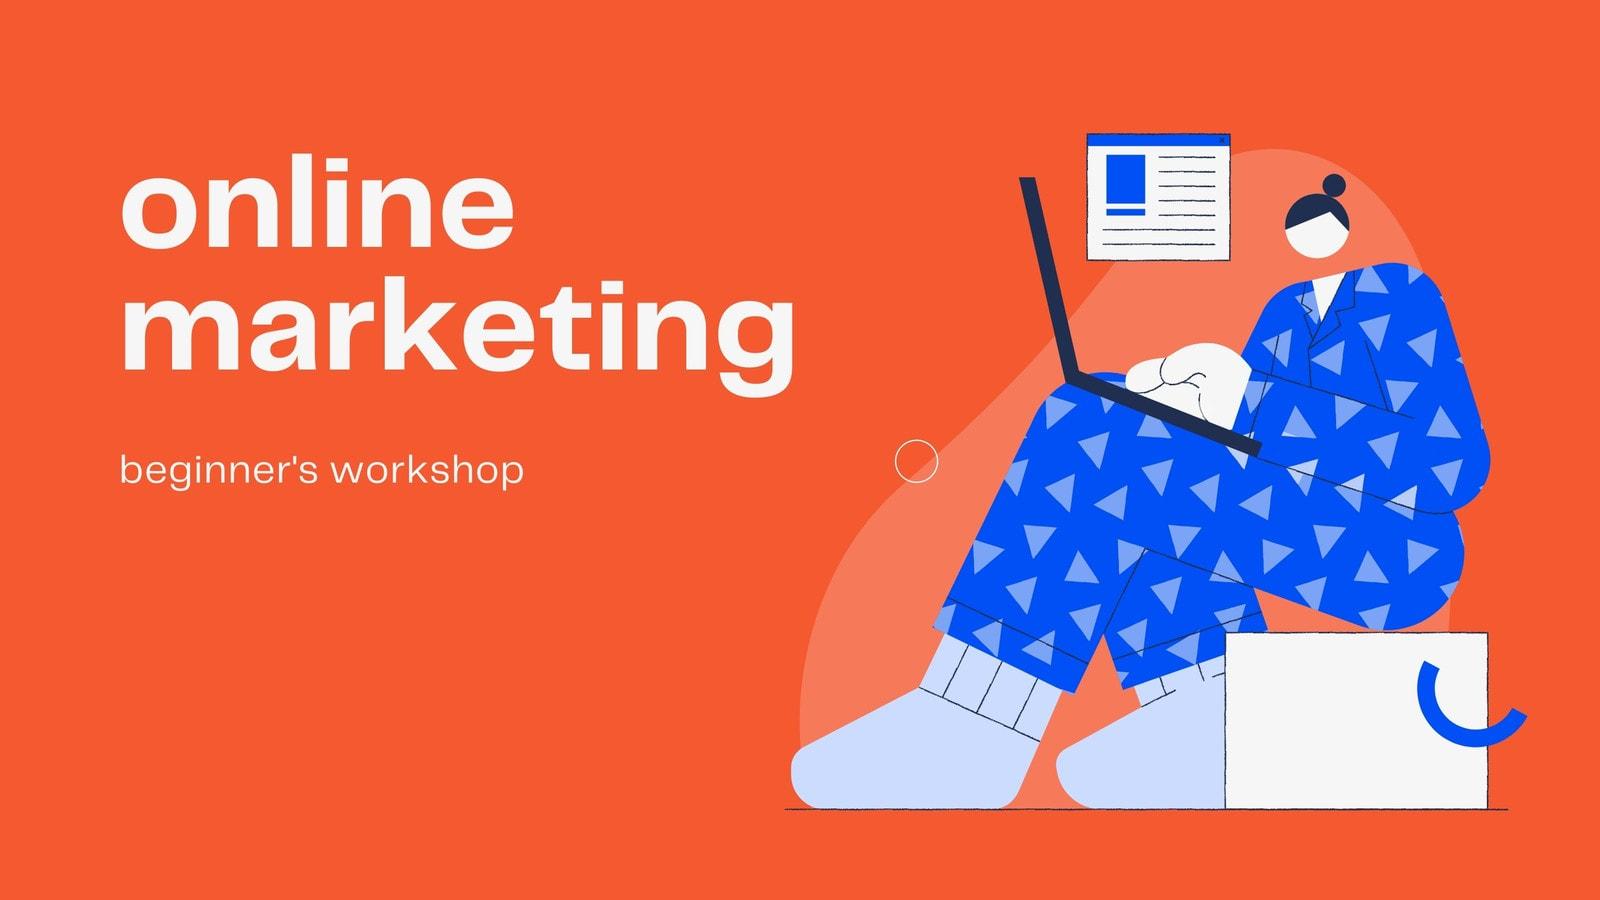 Bold Orange and Blue Illustrated Online Marketing Video Presentation